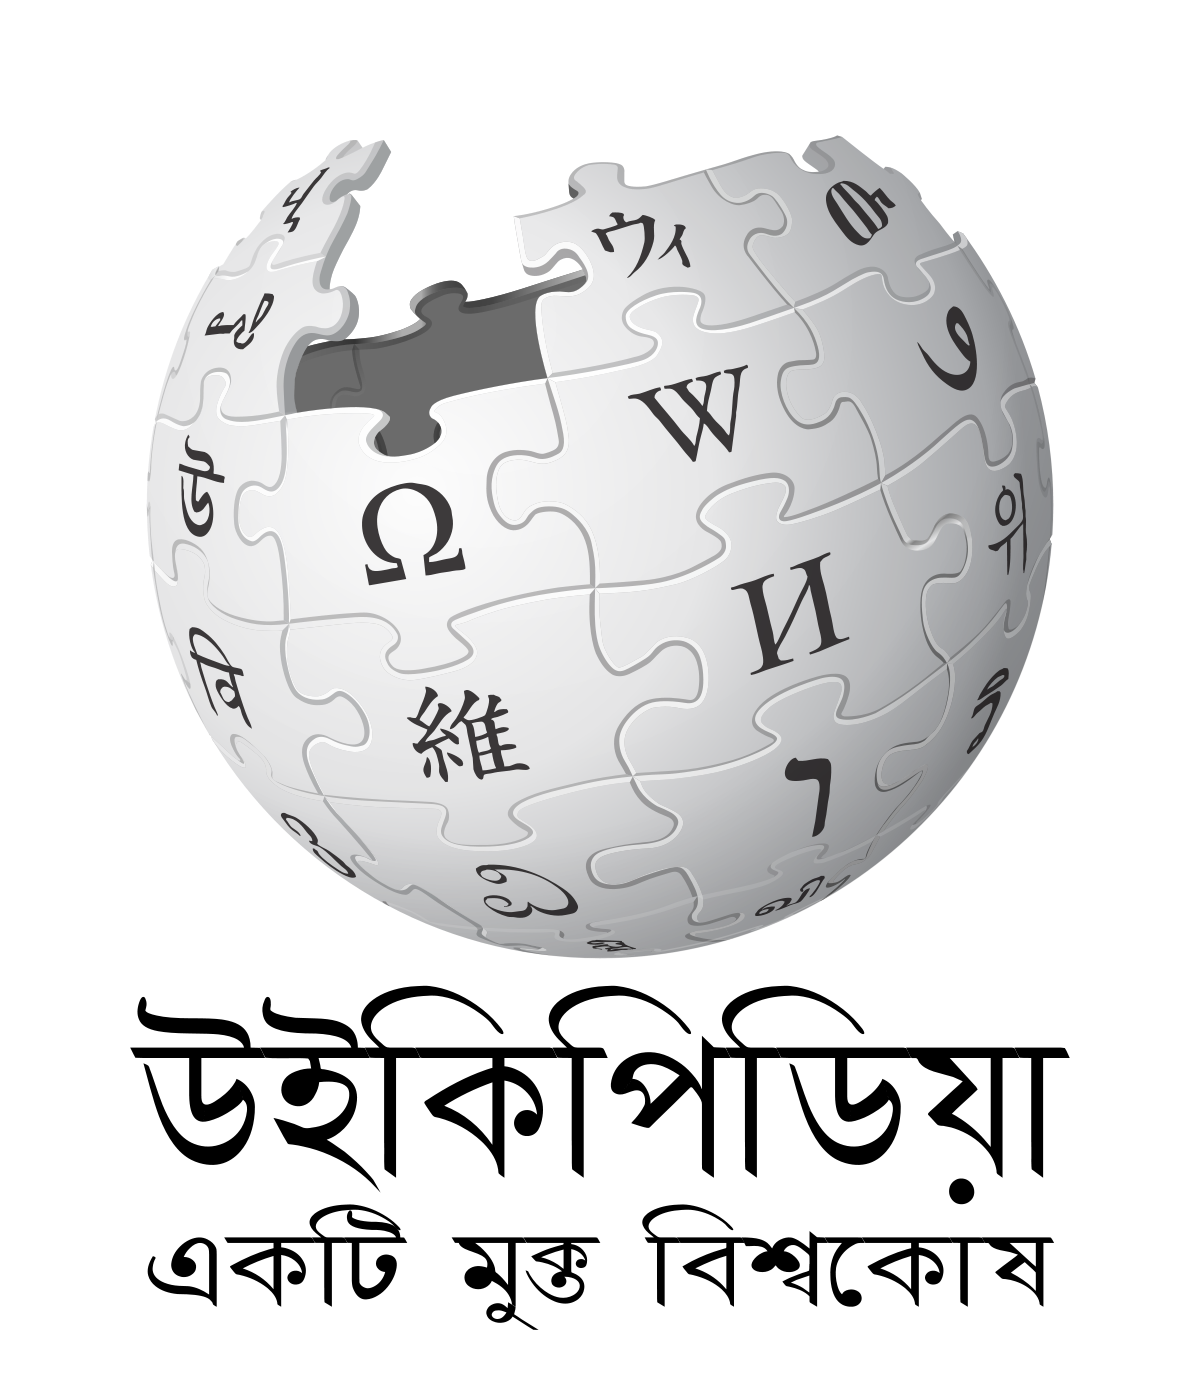 019 1200px Wikipedia Logo V2 Bn Svg Save Water Essay Awful Life In Tamil Gujarati Full